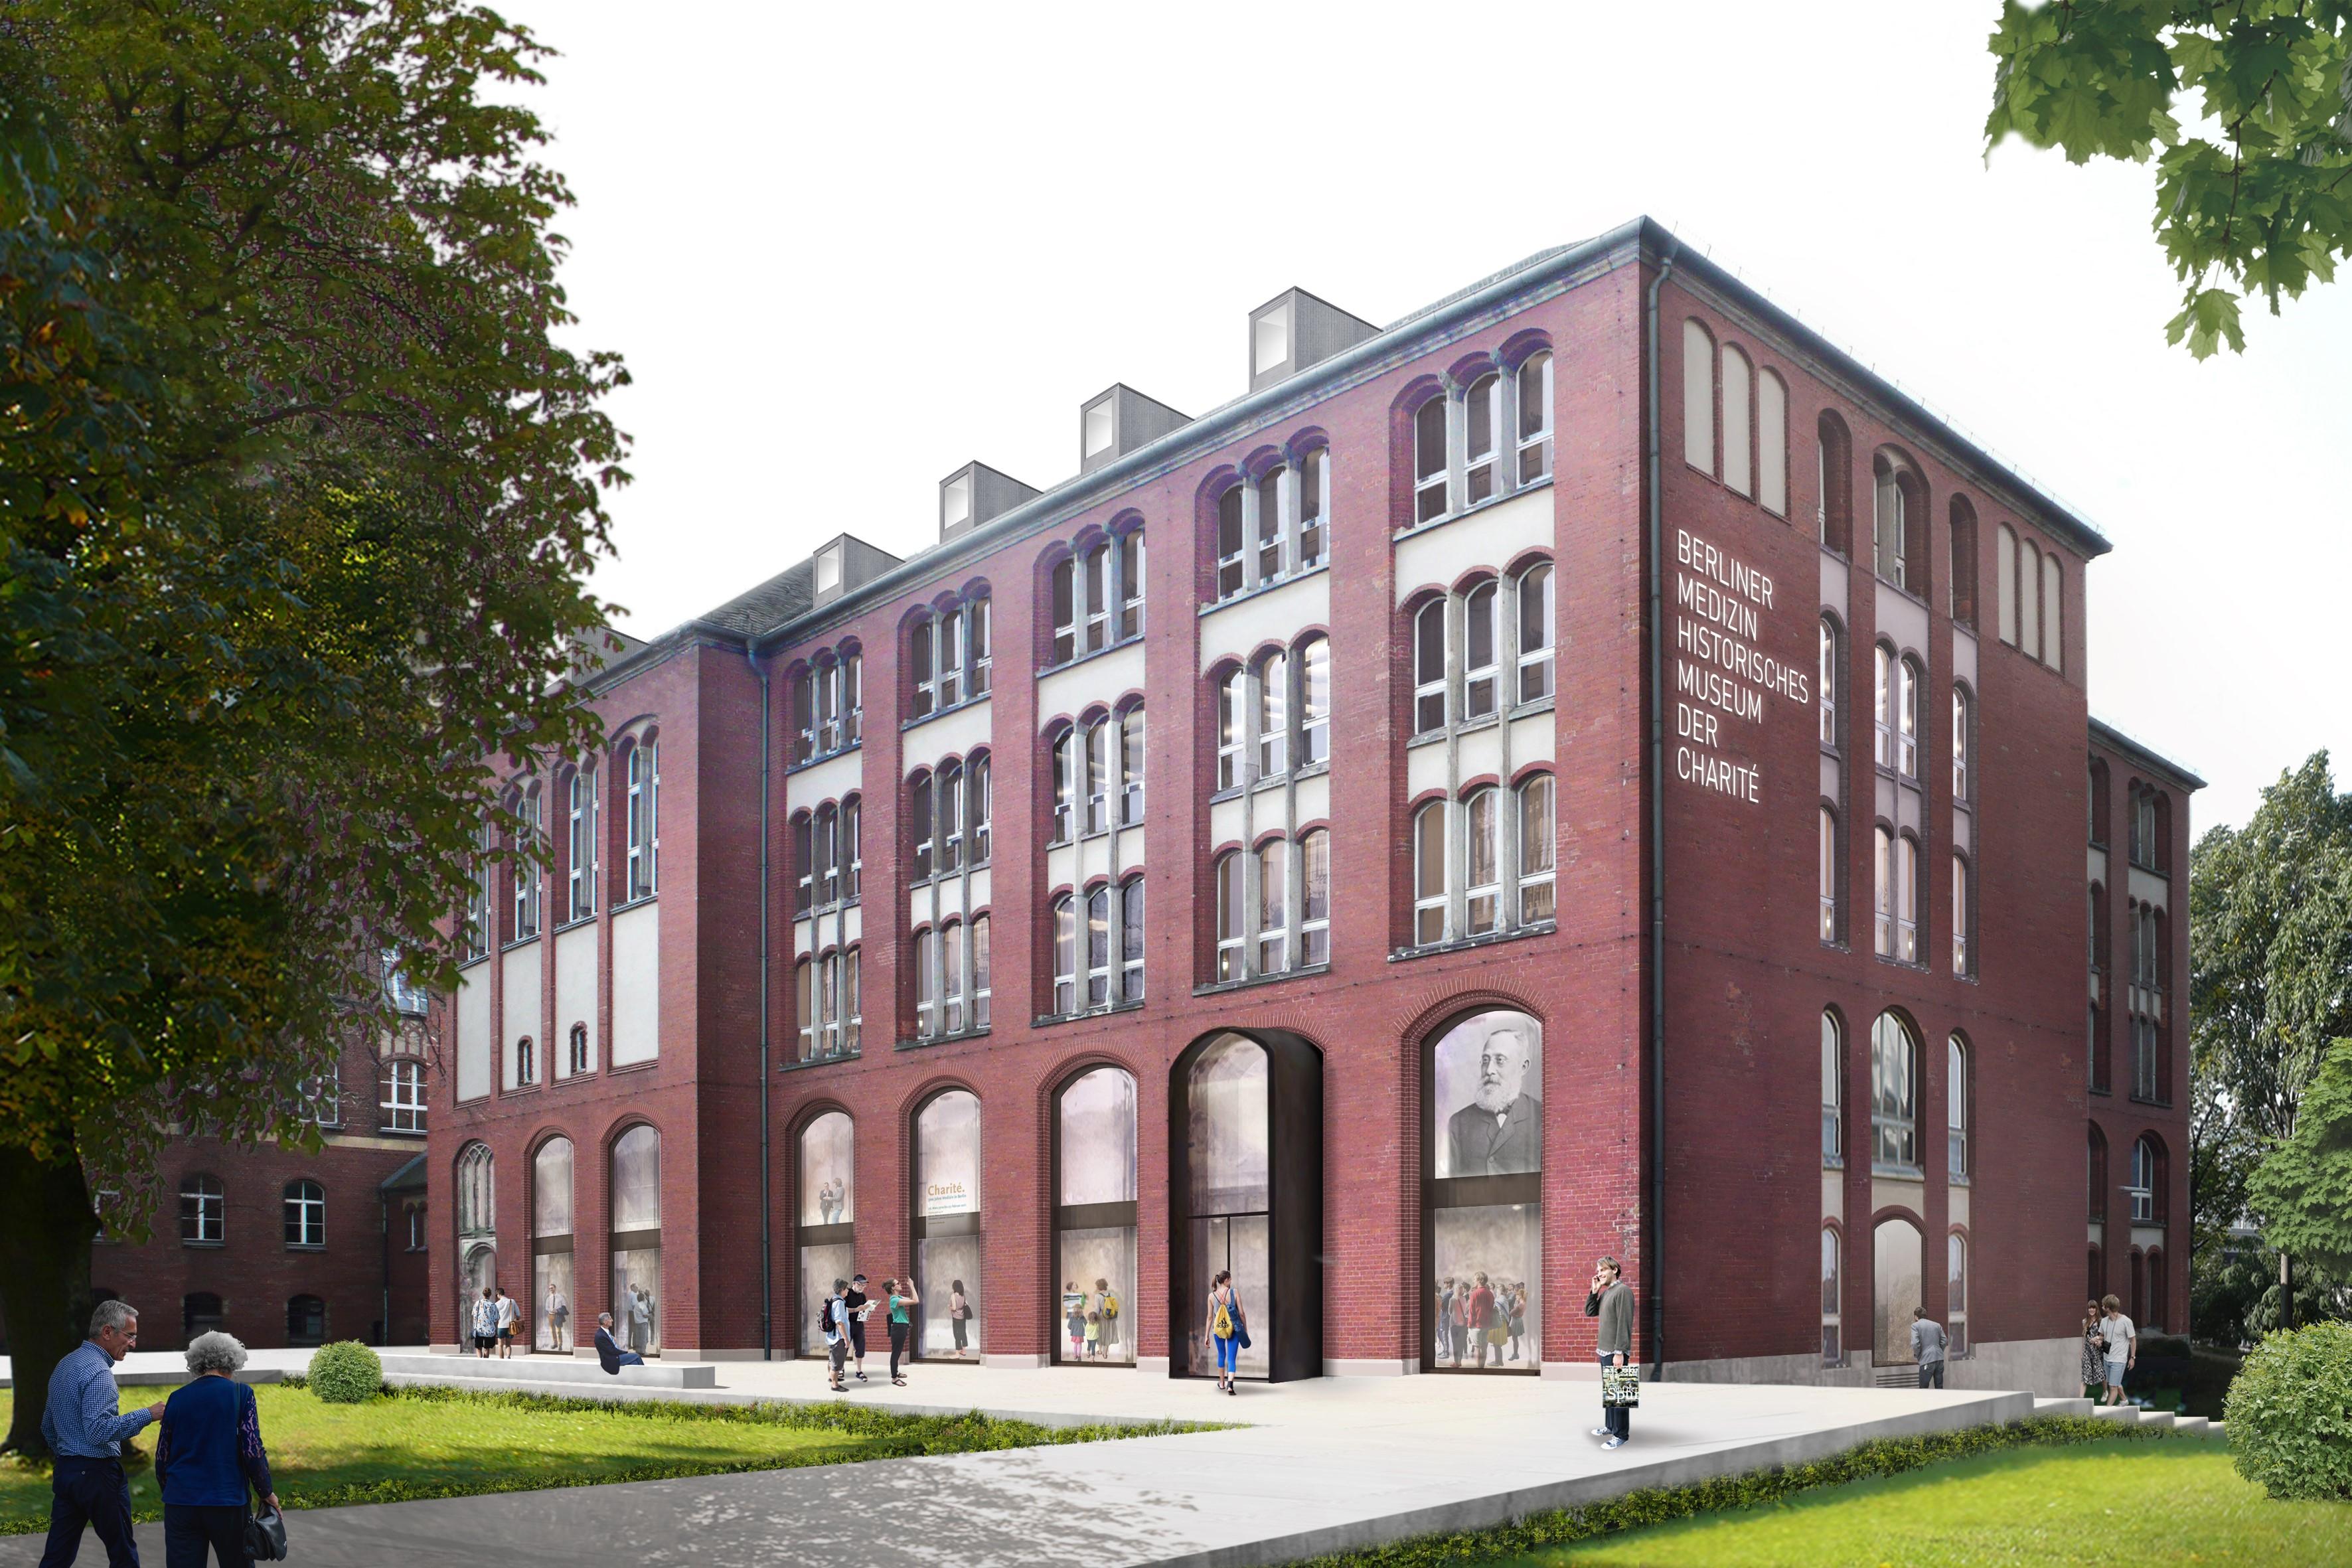 Charite Universitätsmedizin Berlin